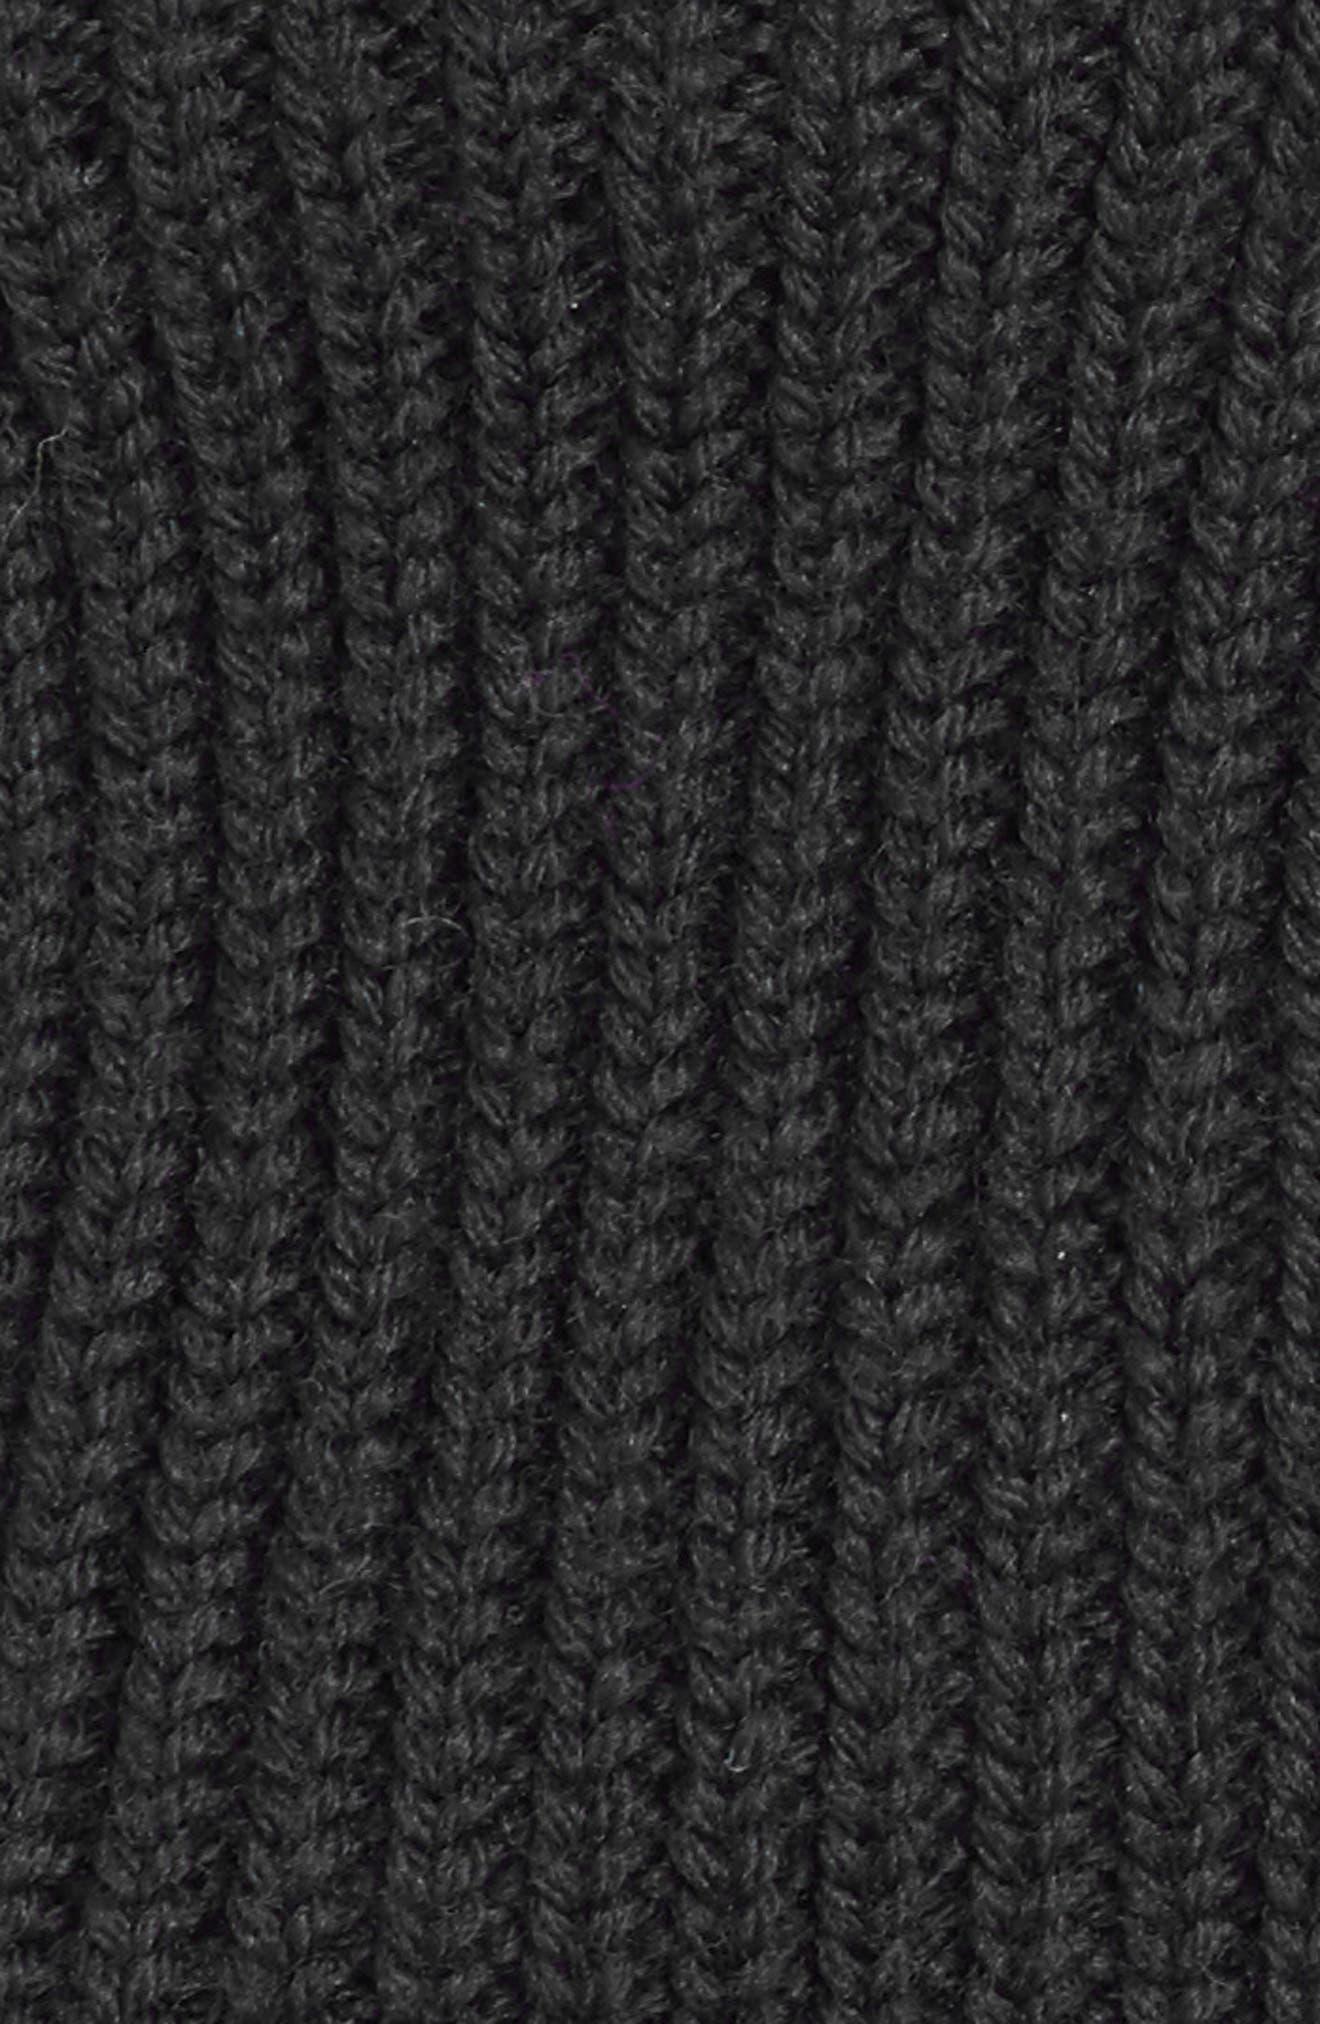 Guanti Wool Long Fingerless Gloves,                             Alternate thumbnail 3, color,                             001